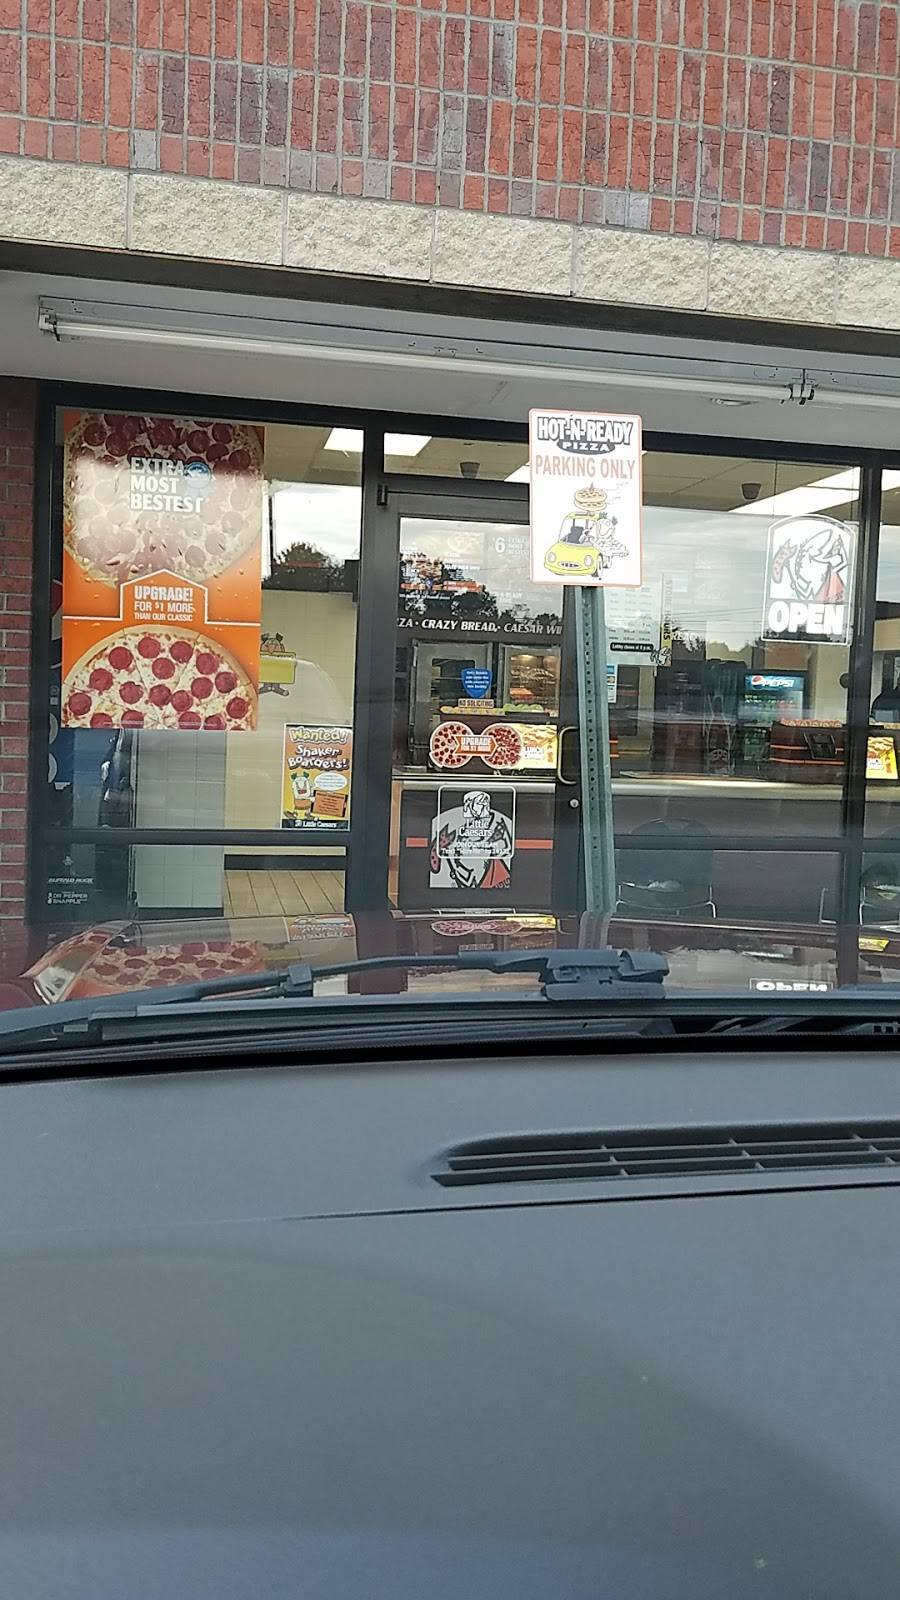 Little Caesars Pizza | meal takeaway | 1421 Forestdale Blvd, Birmingham, AL 35214, USA | 2057916988 OR +1 205-791-6988